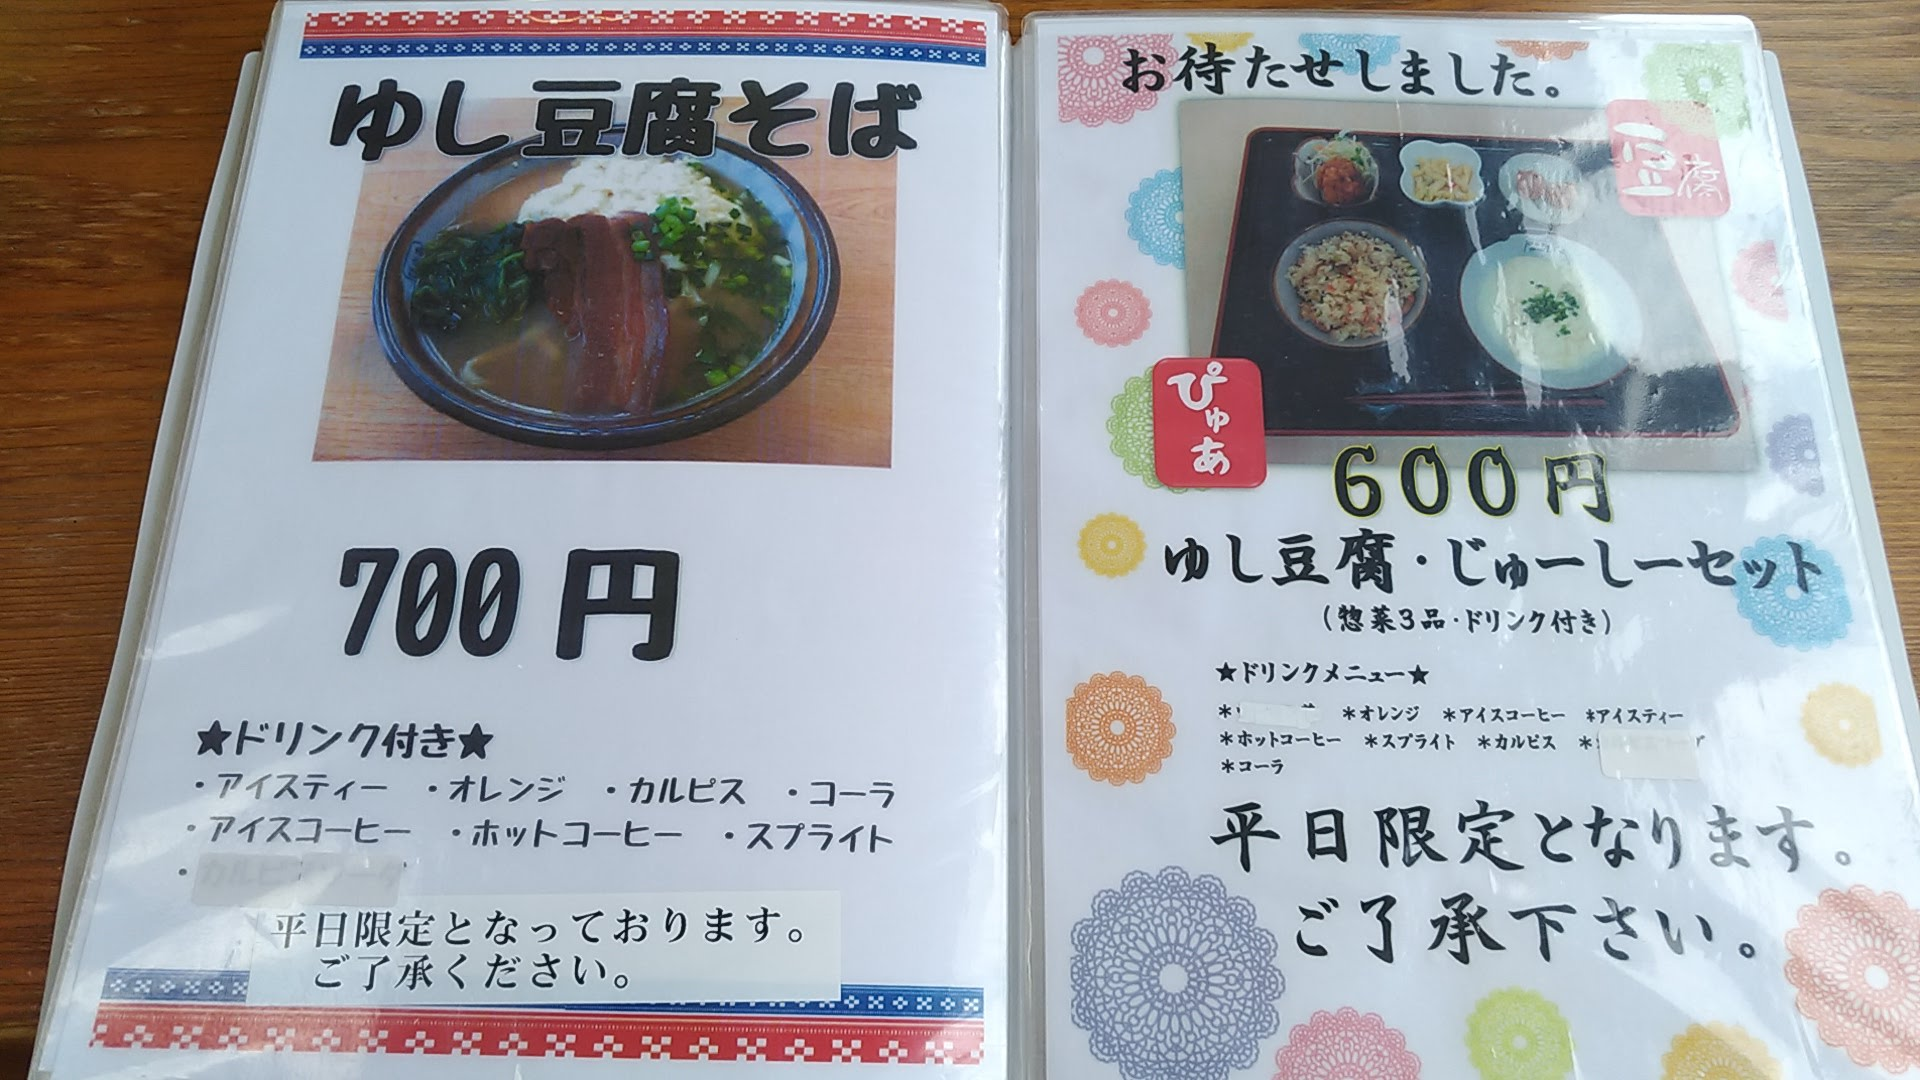 the menu of Pure shokudou 10